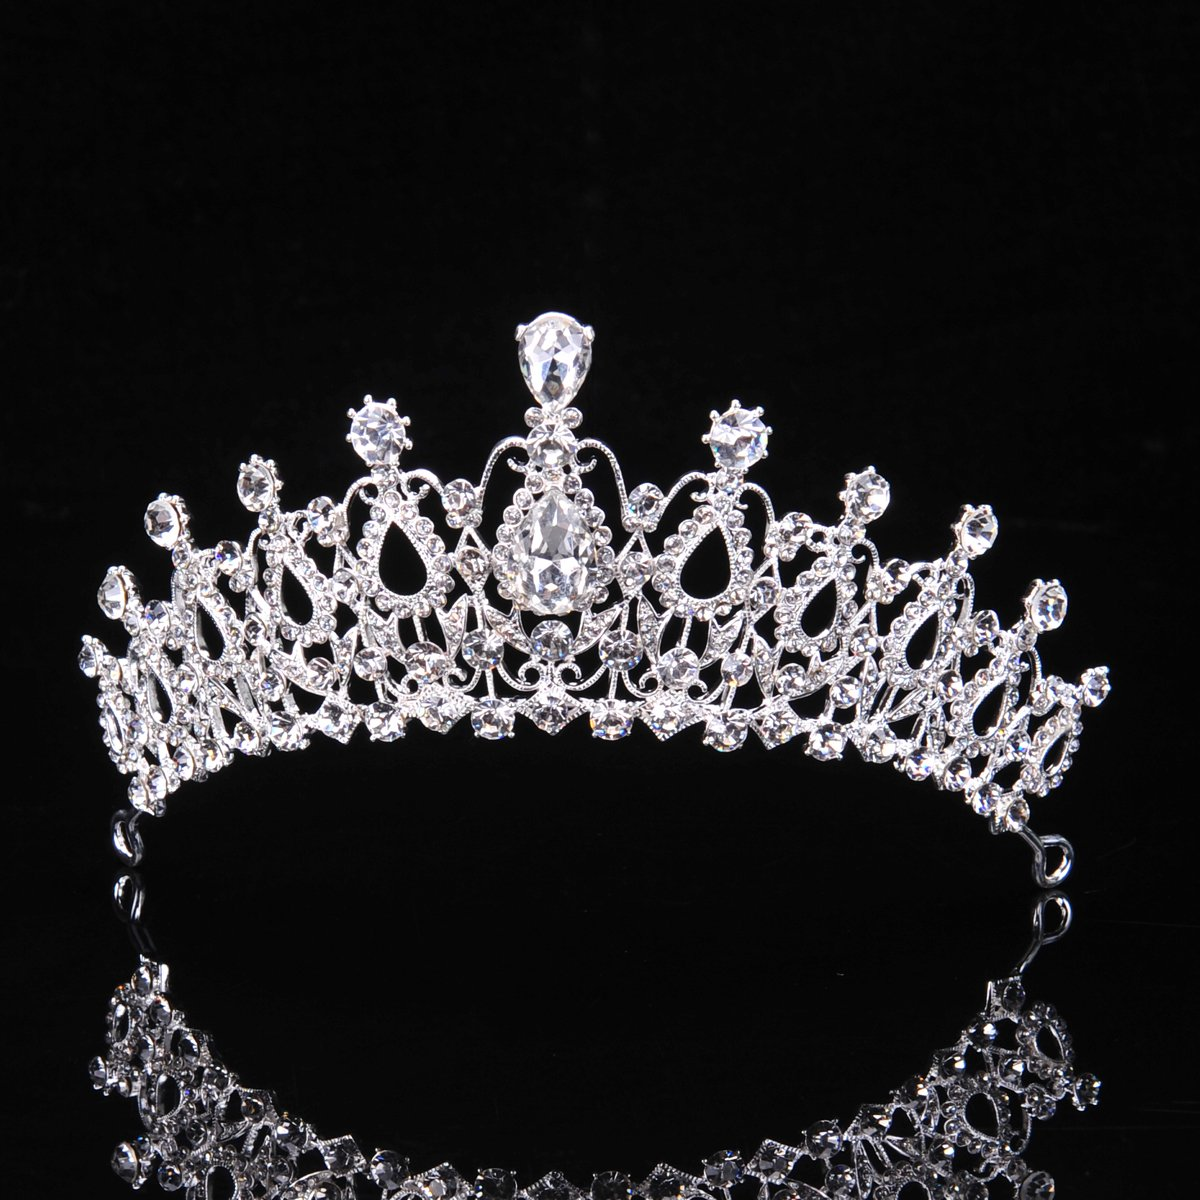 Amazon.com : Royal Bridal Pageant Rhinestone Crystal Prom